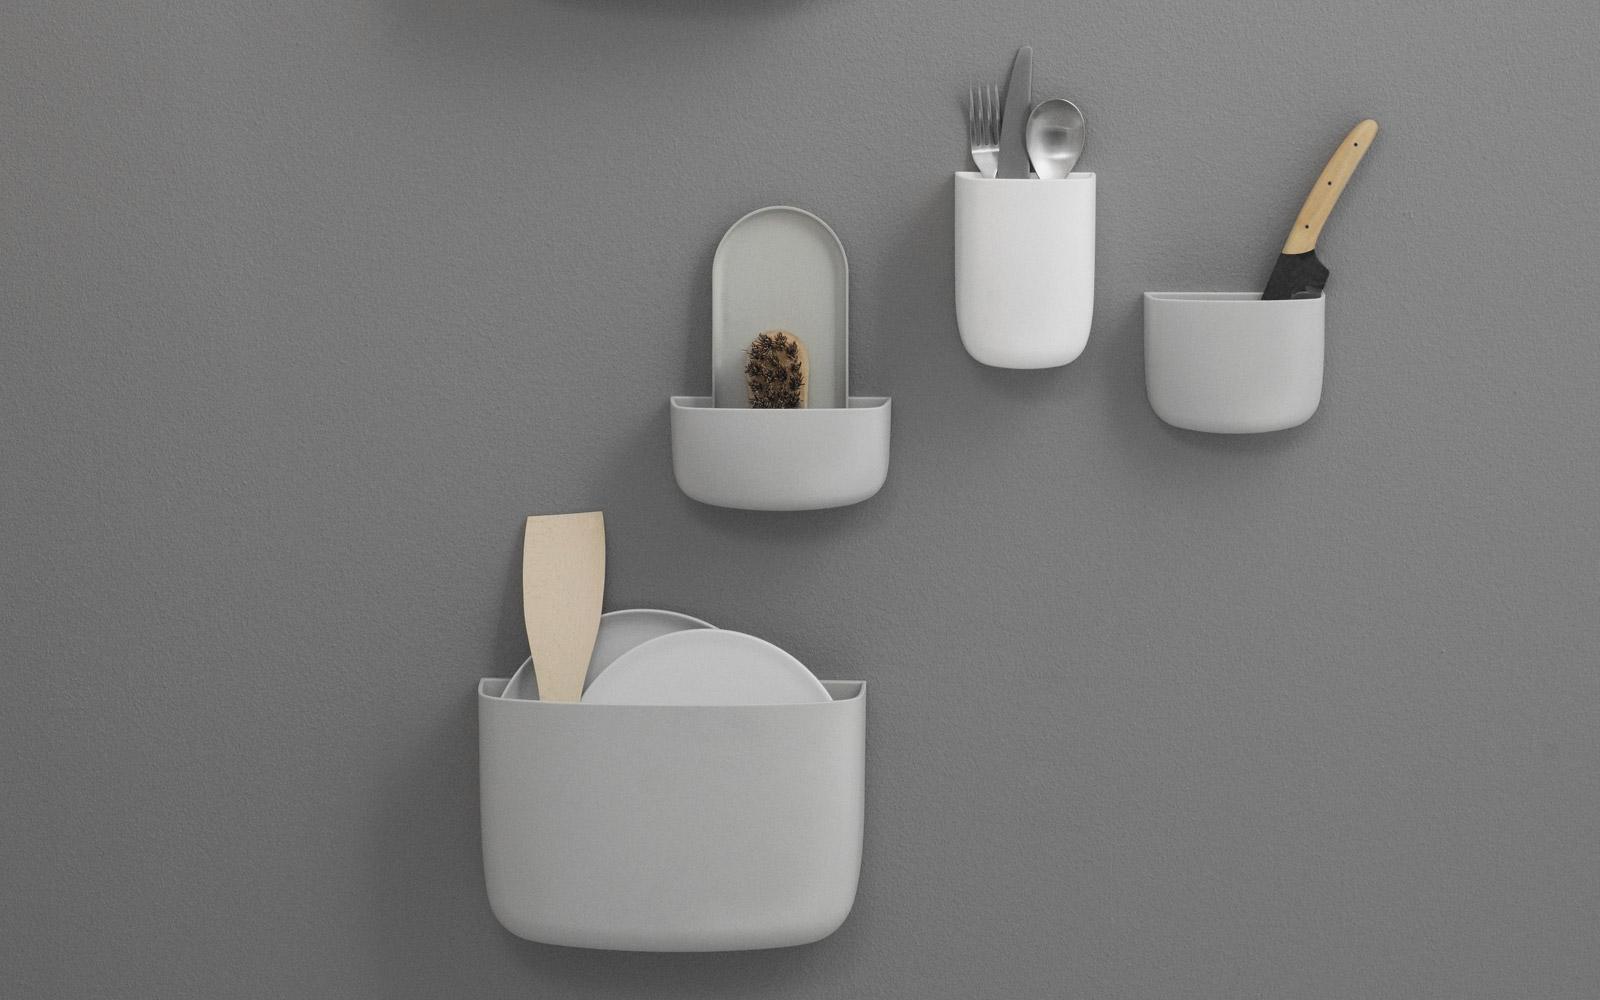 Pocket organizer flexible wall mounted storage solution